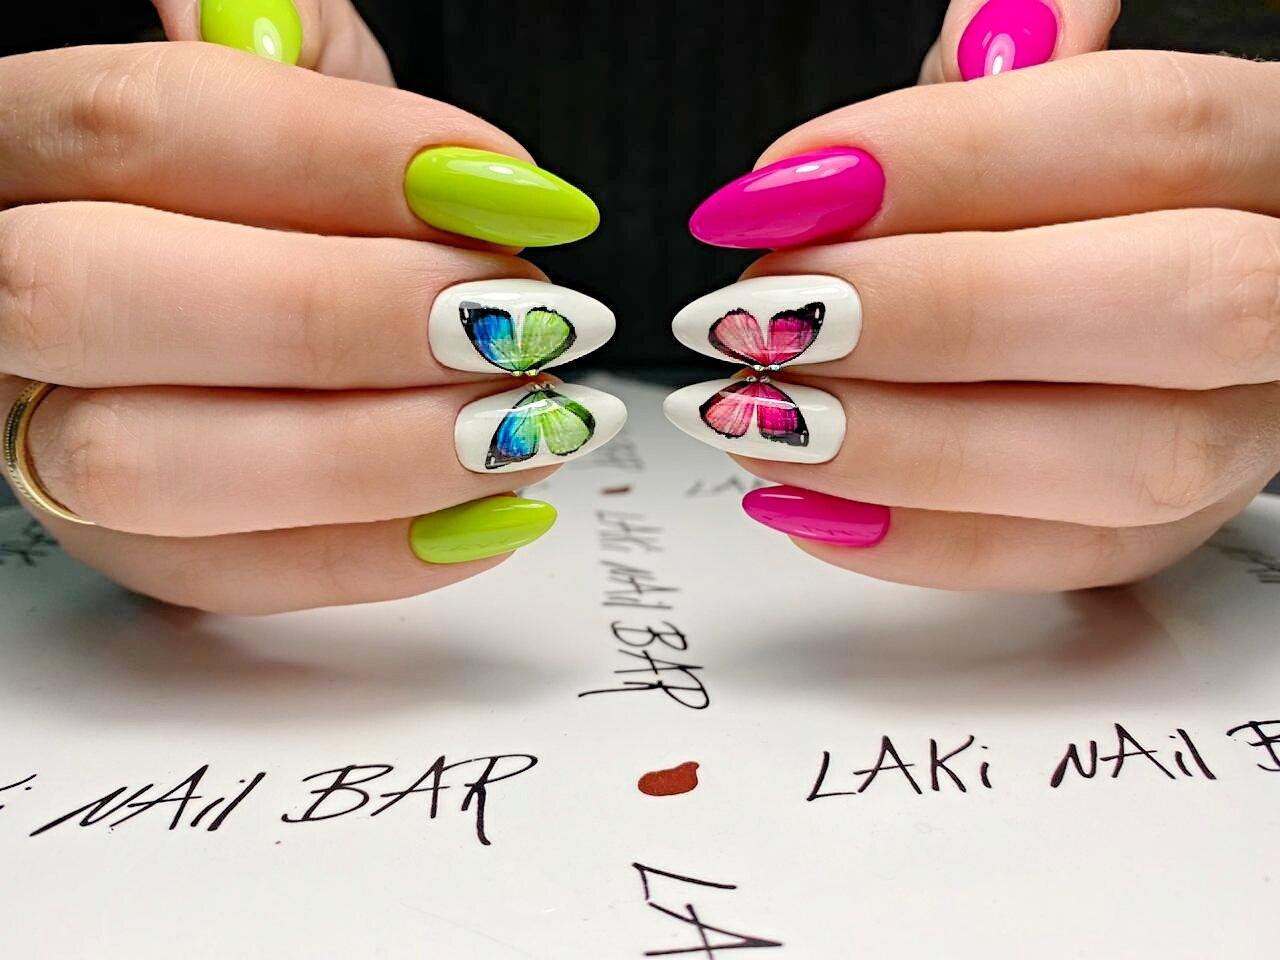 Laki Nail Bar